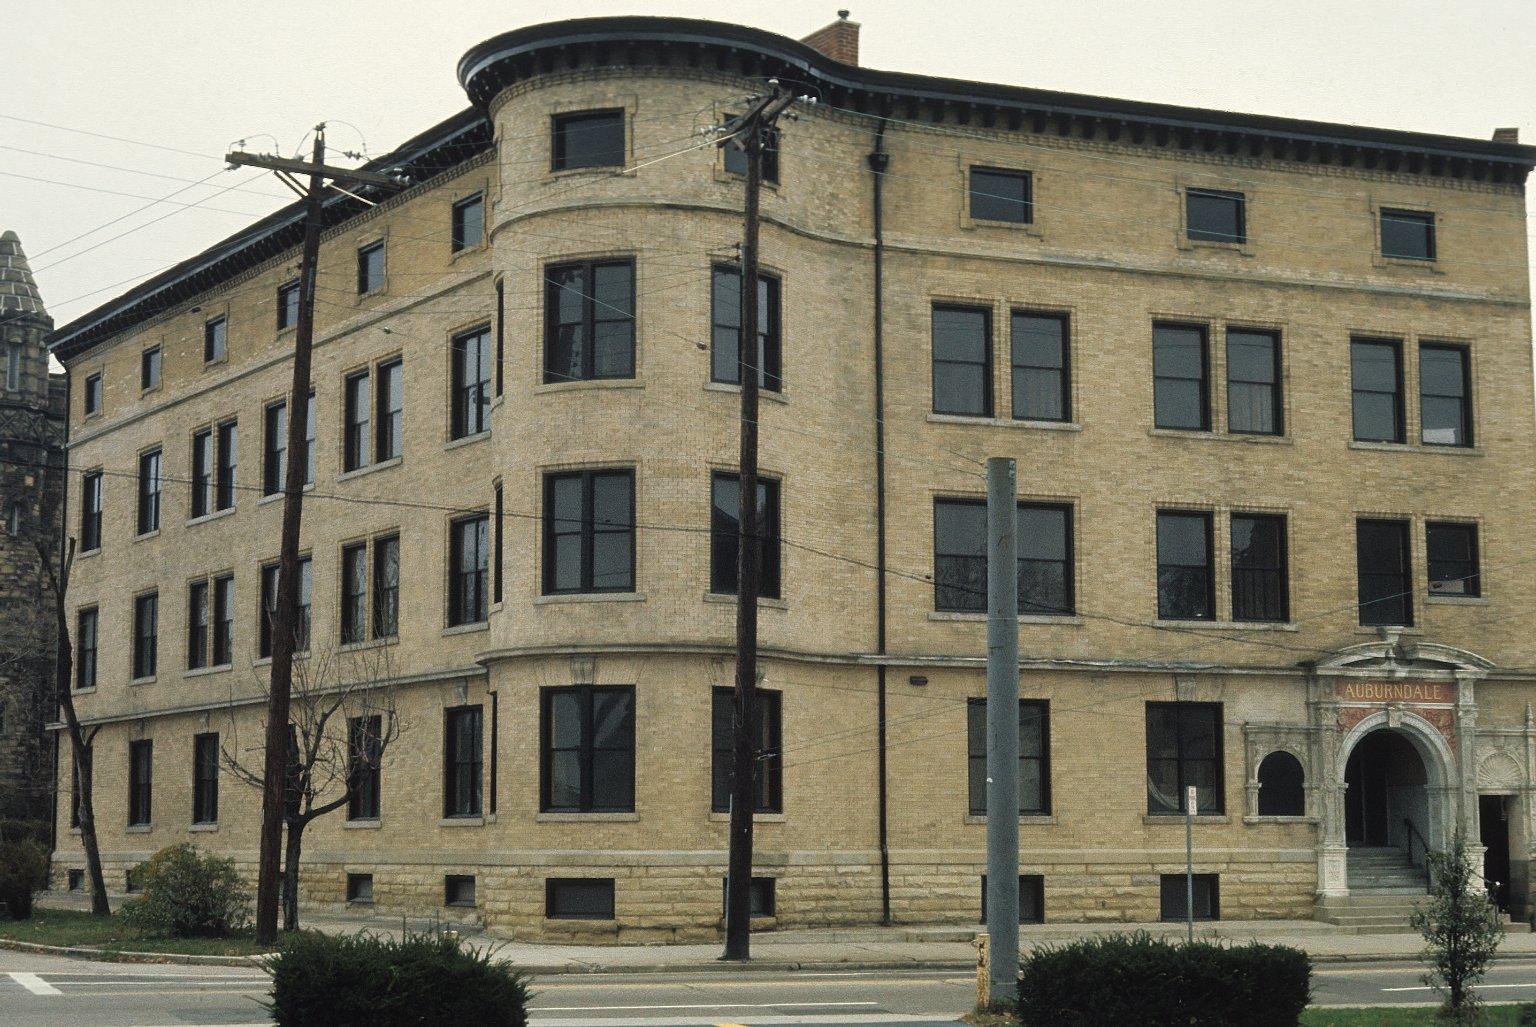 Auburndale Apartments